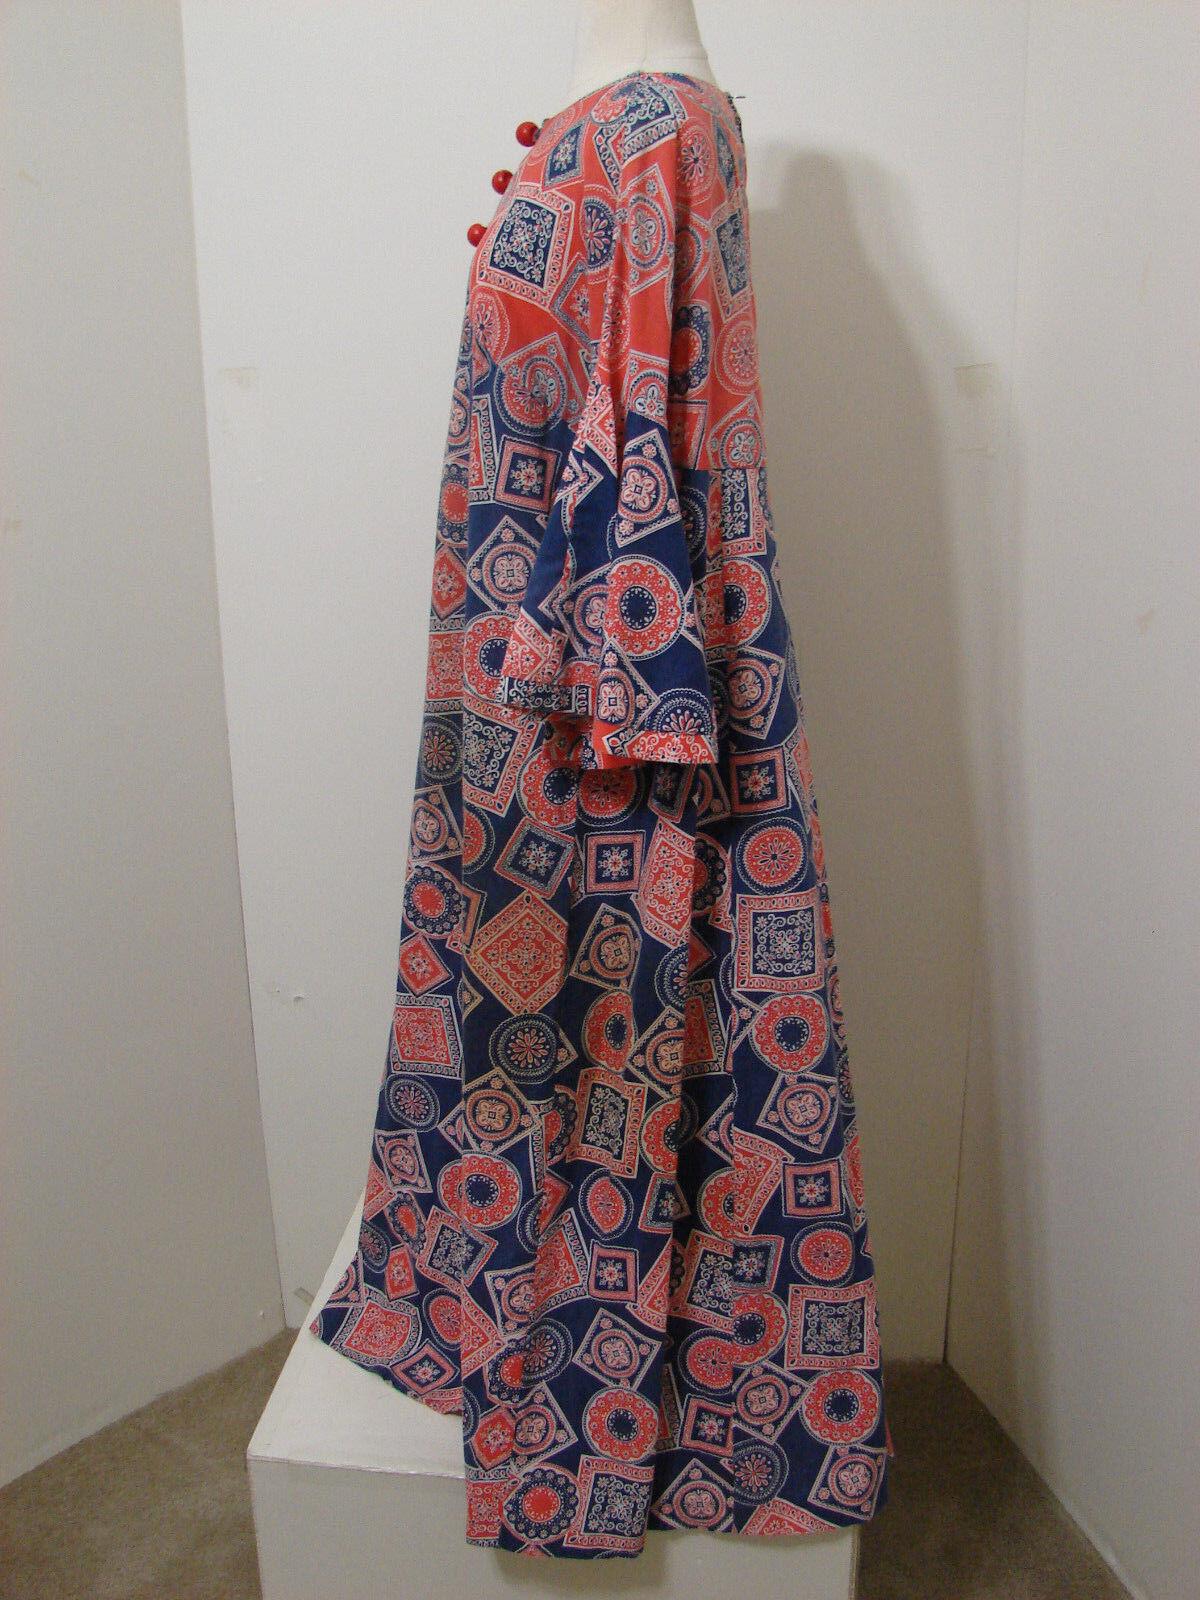 PEGGY LOU Caftan Dress Vintage 1960's Groovy Patc… - image 6